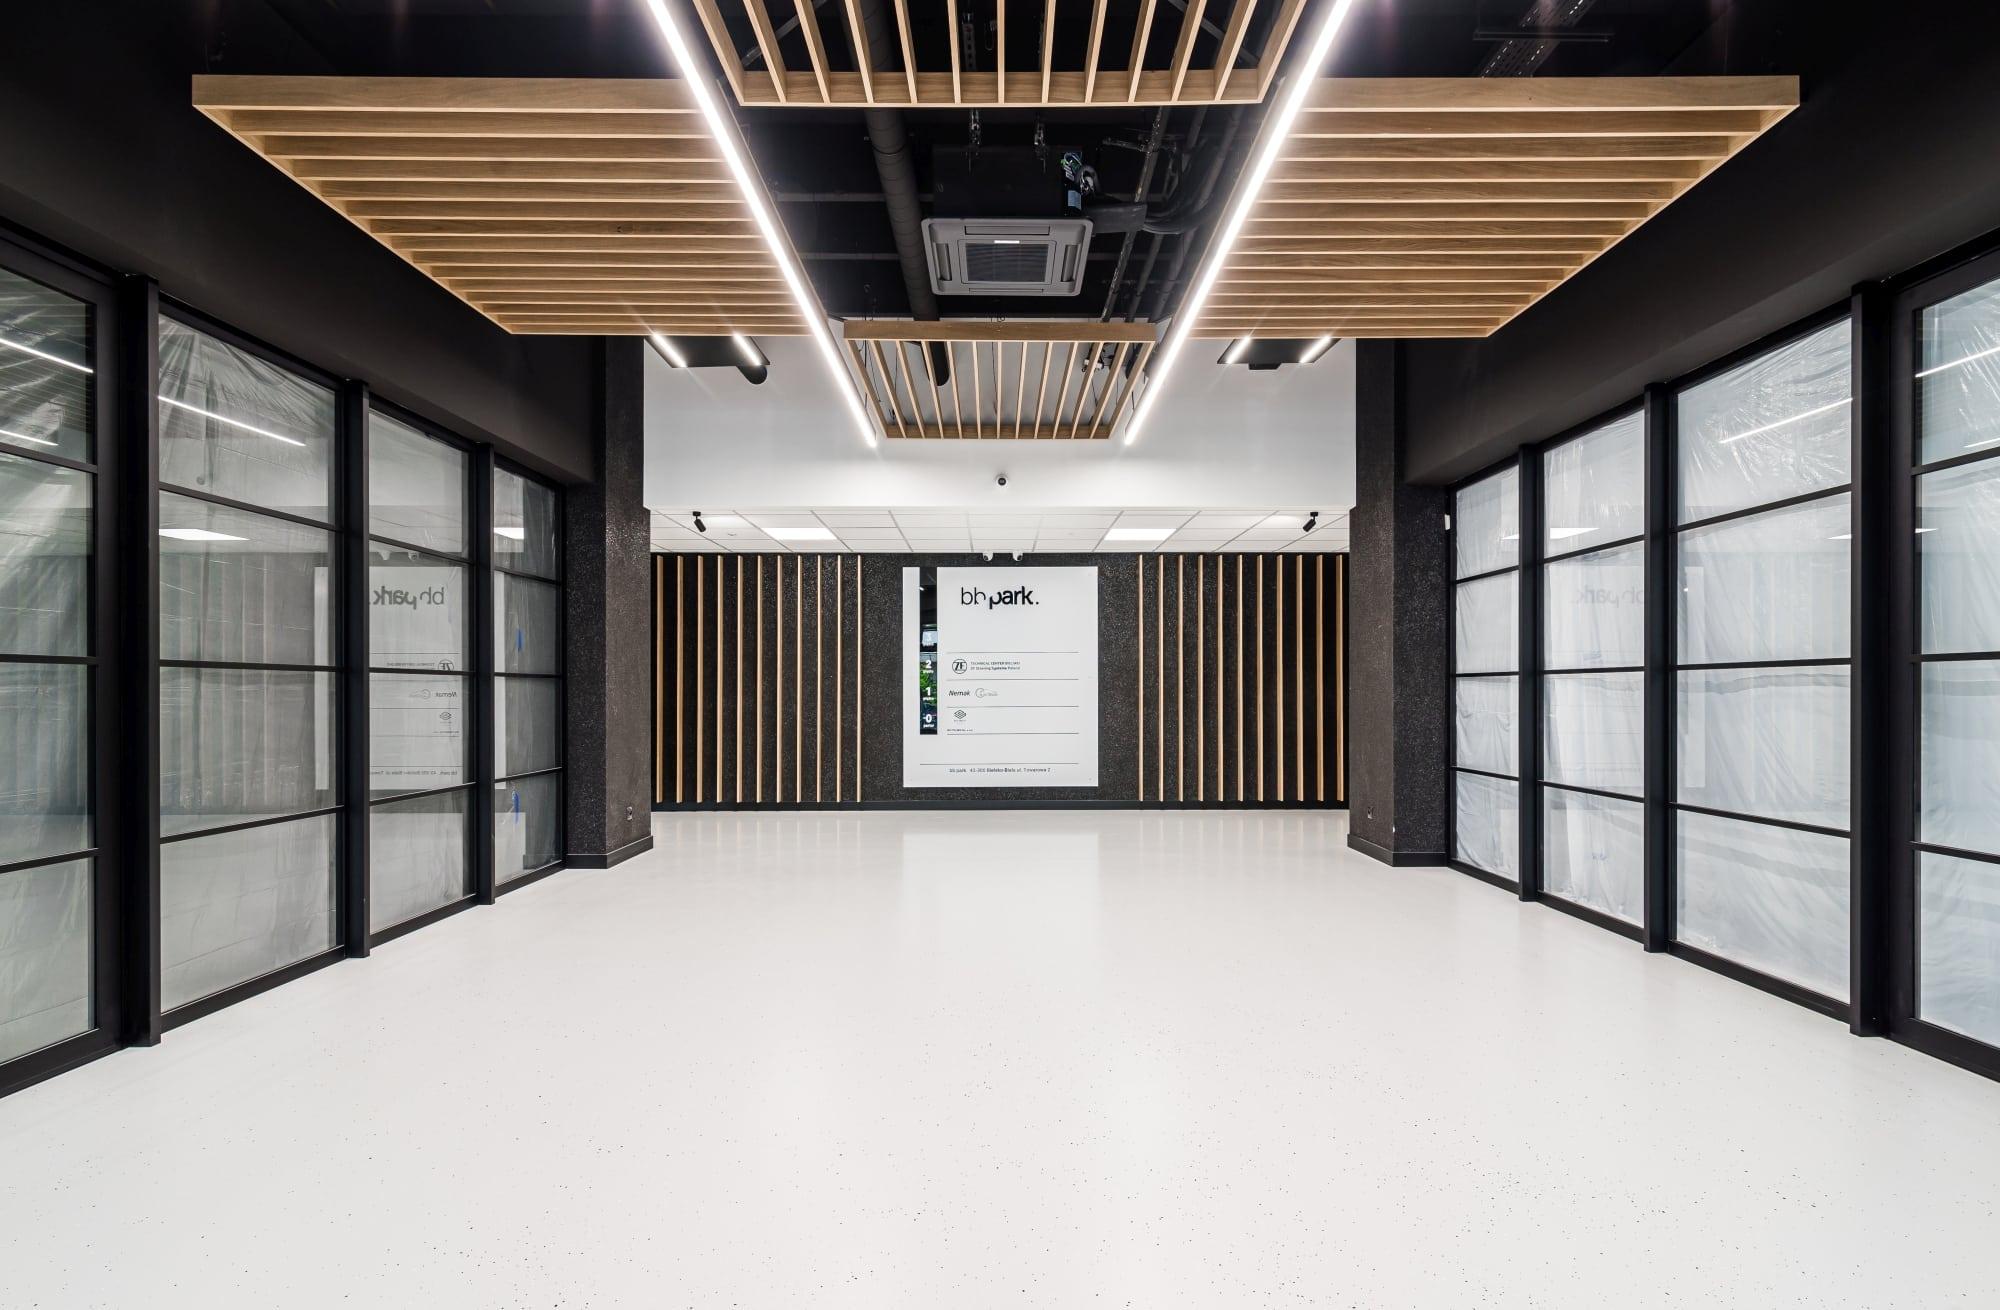 Inter-floor posadzka dekoracyjna